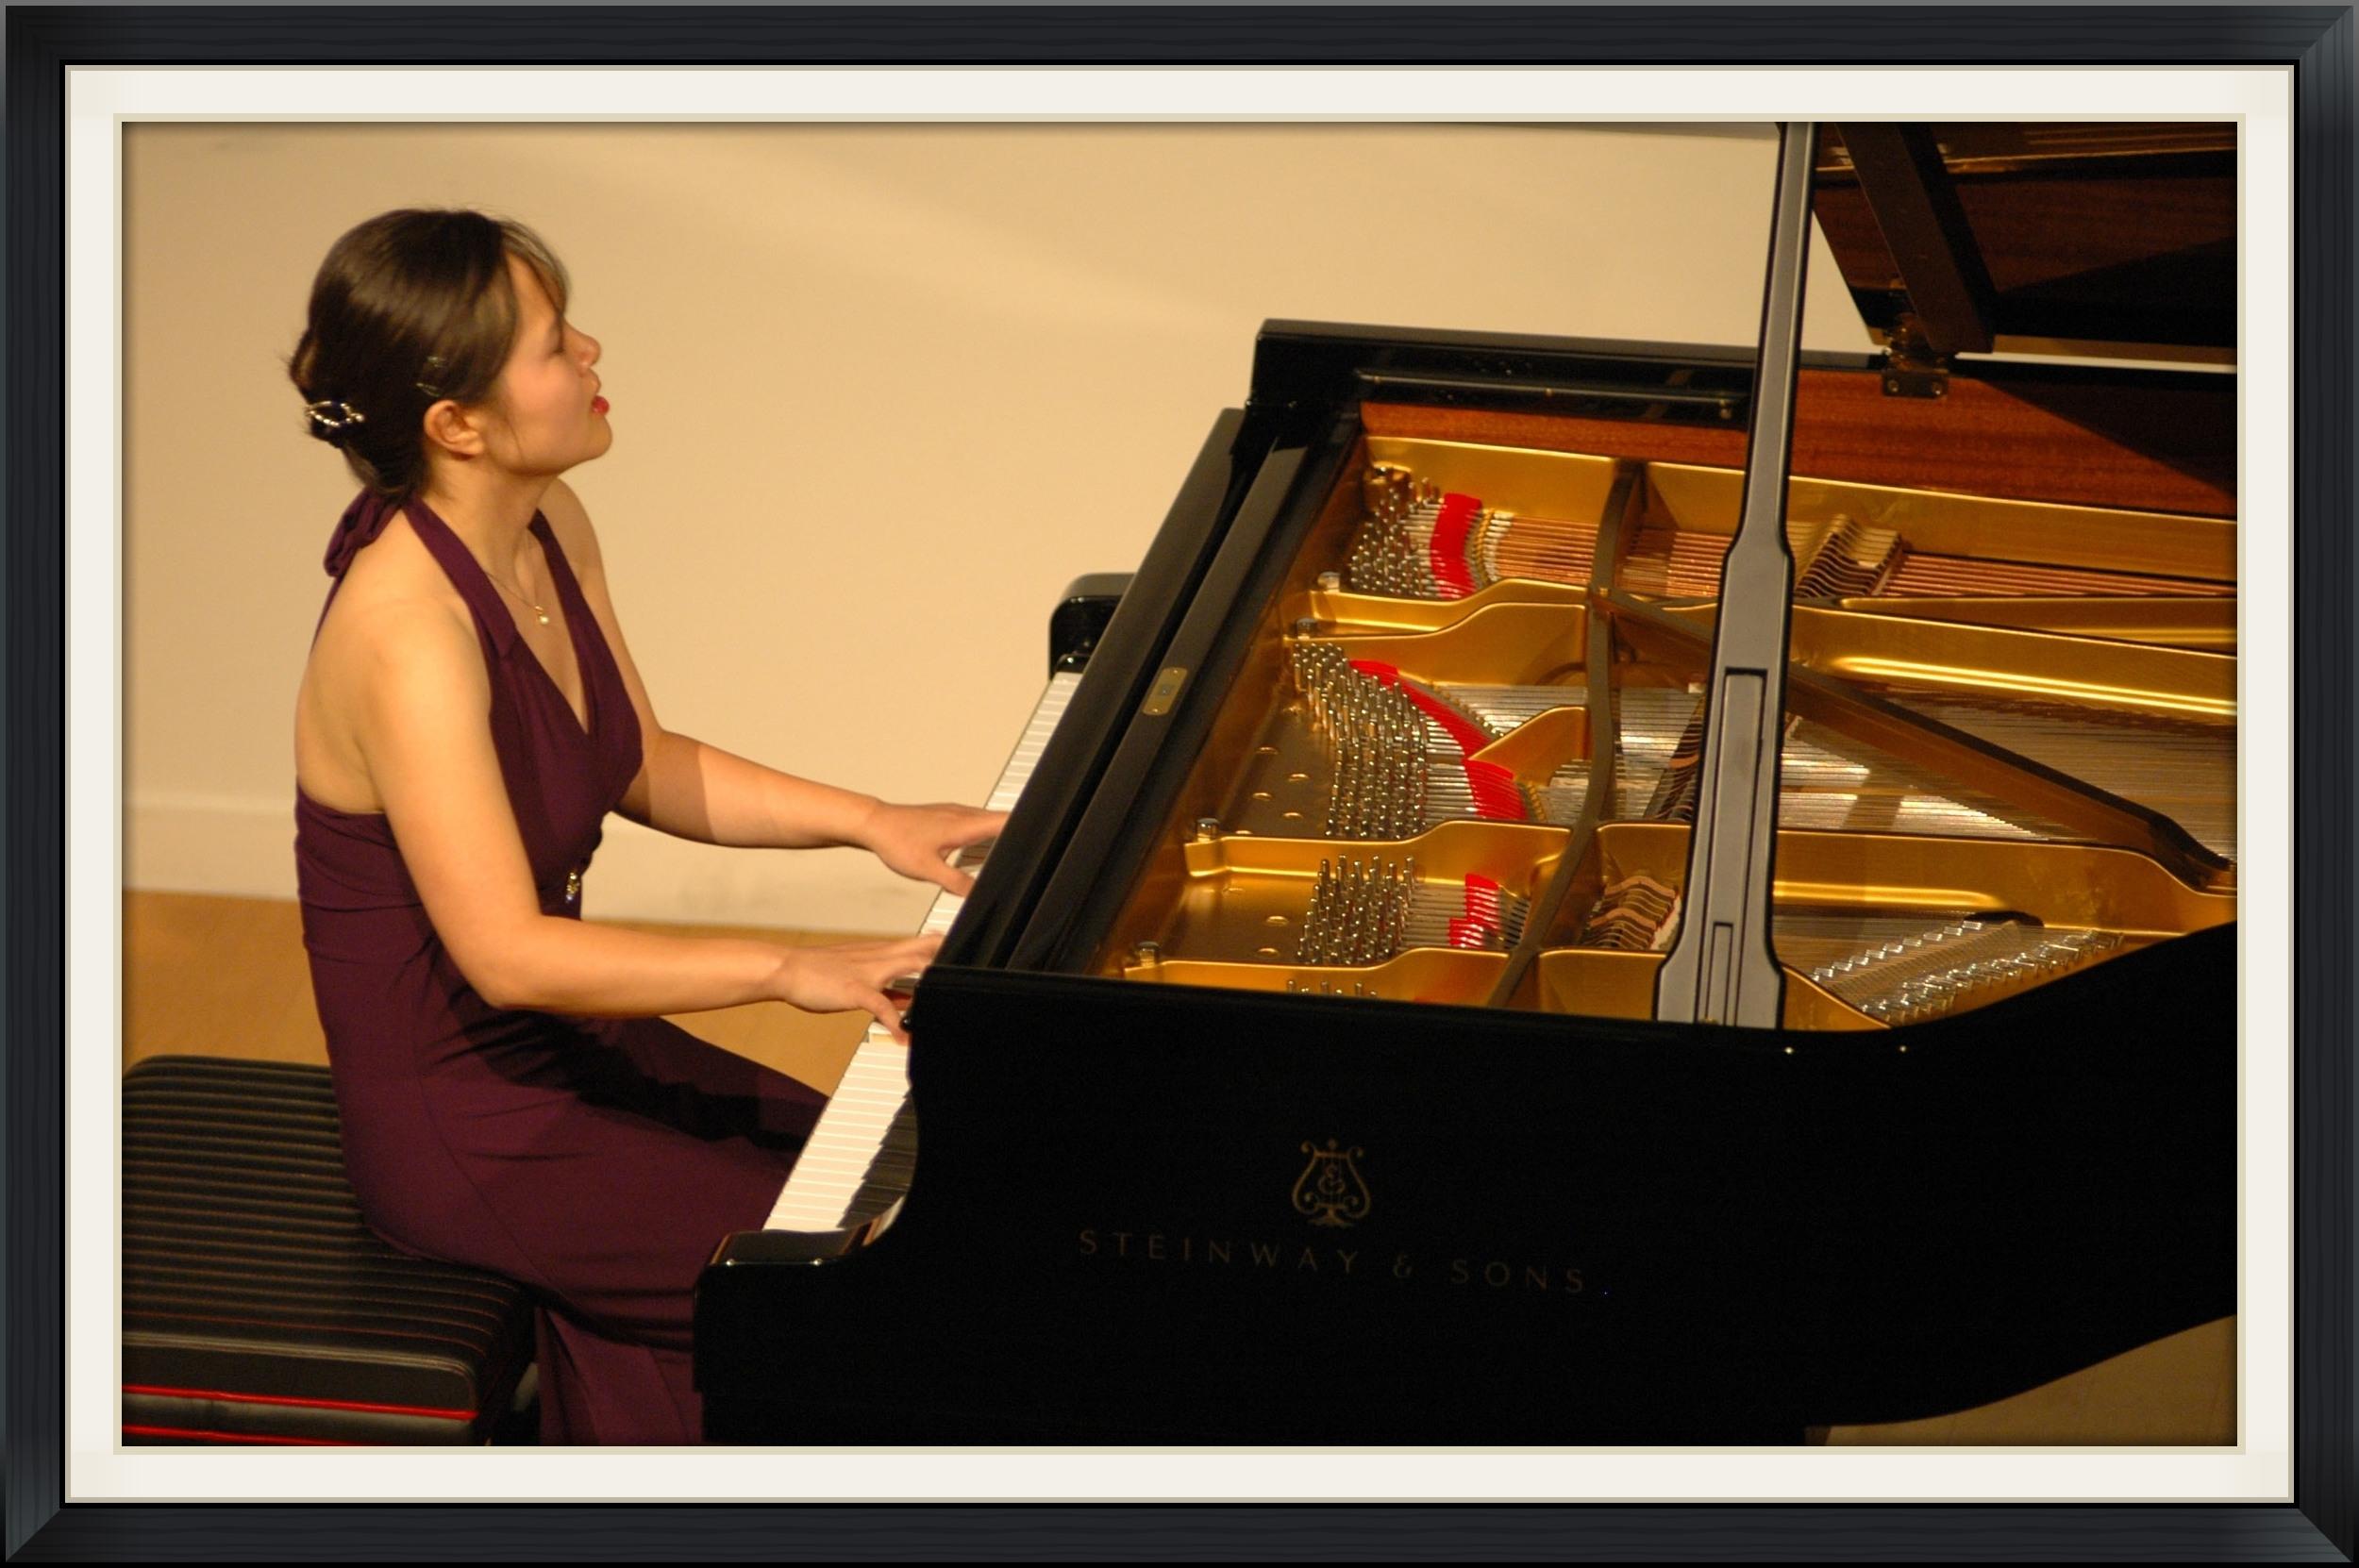 Menlo 08 Bach concert.jpg